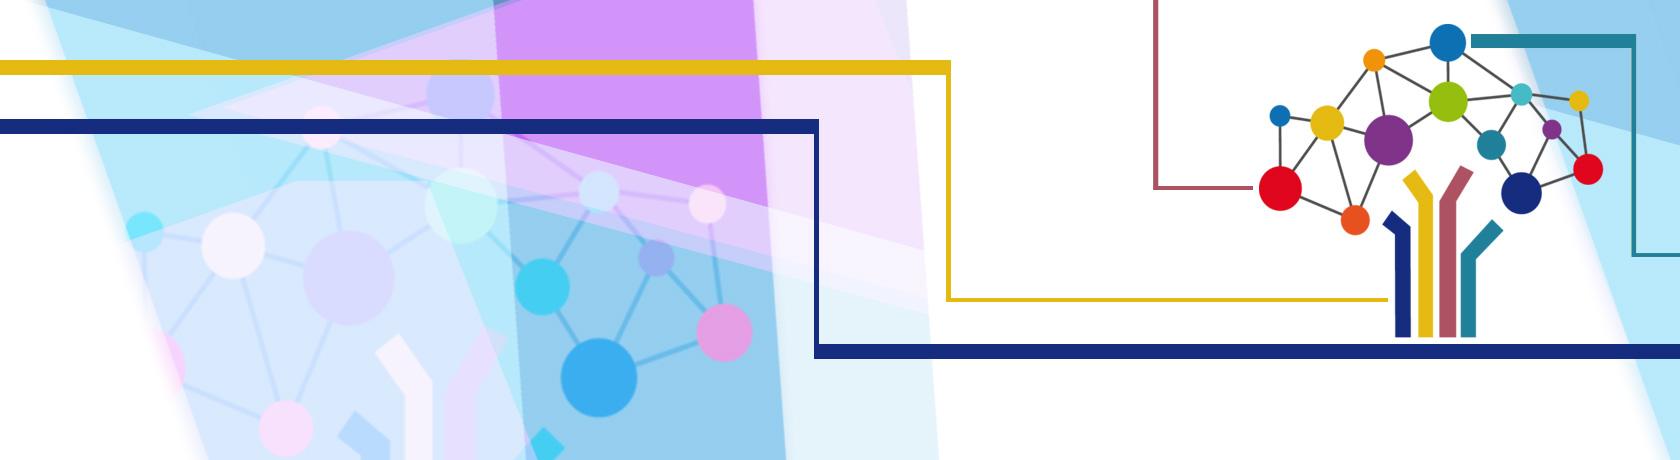 montage image dérivée du logo bilan social